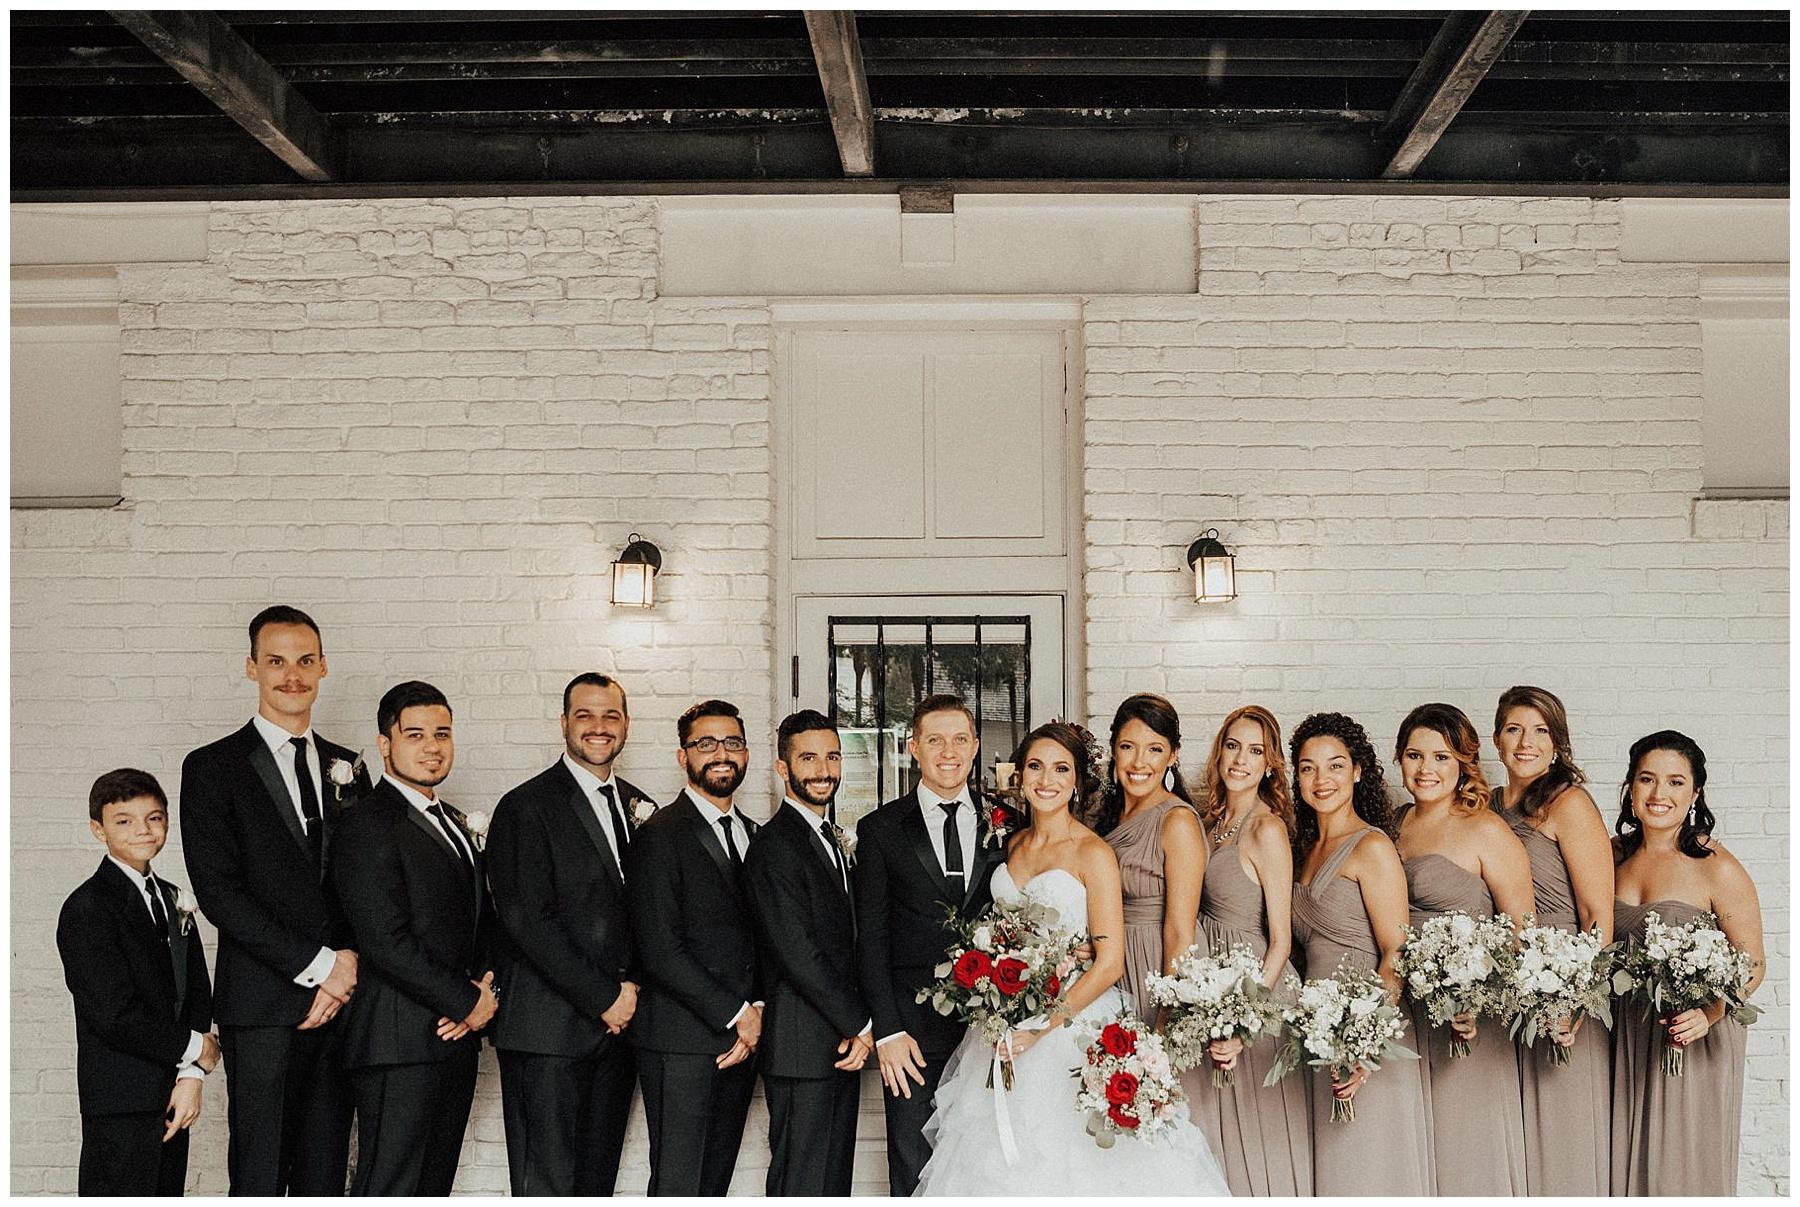 YBOR Wedding Tampa Wedding Photographer-83.jpg